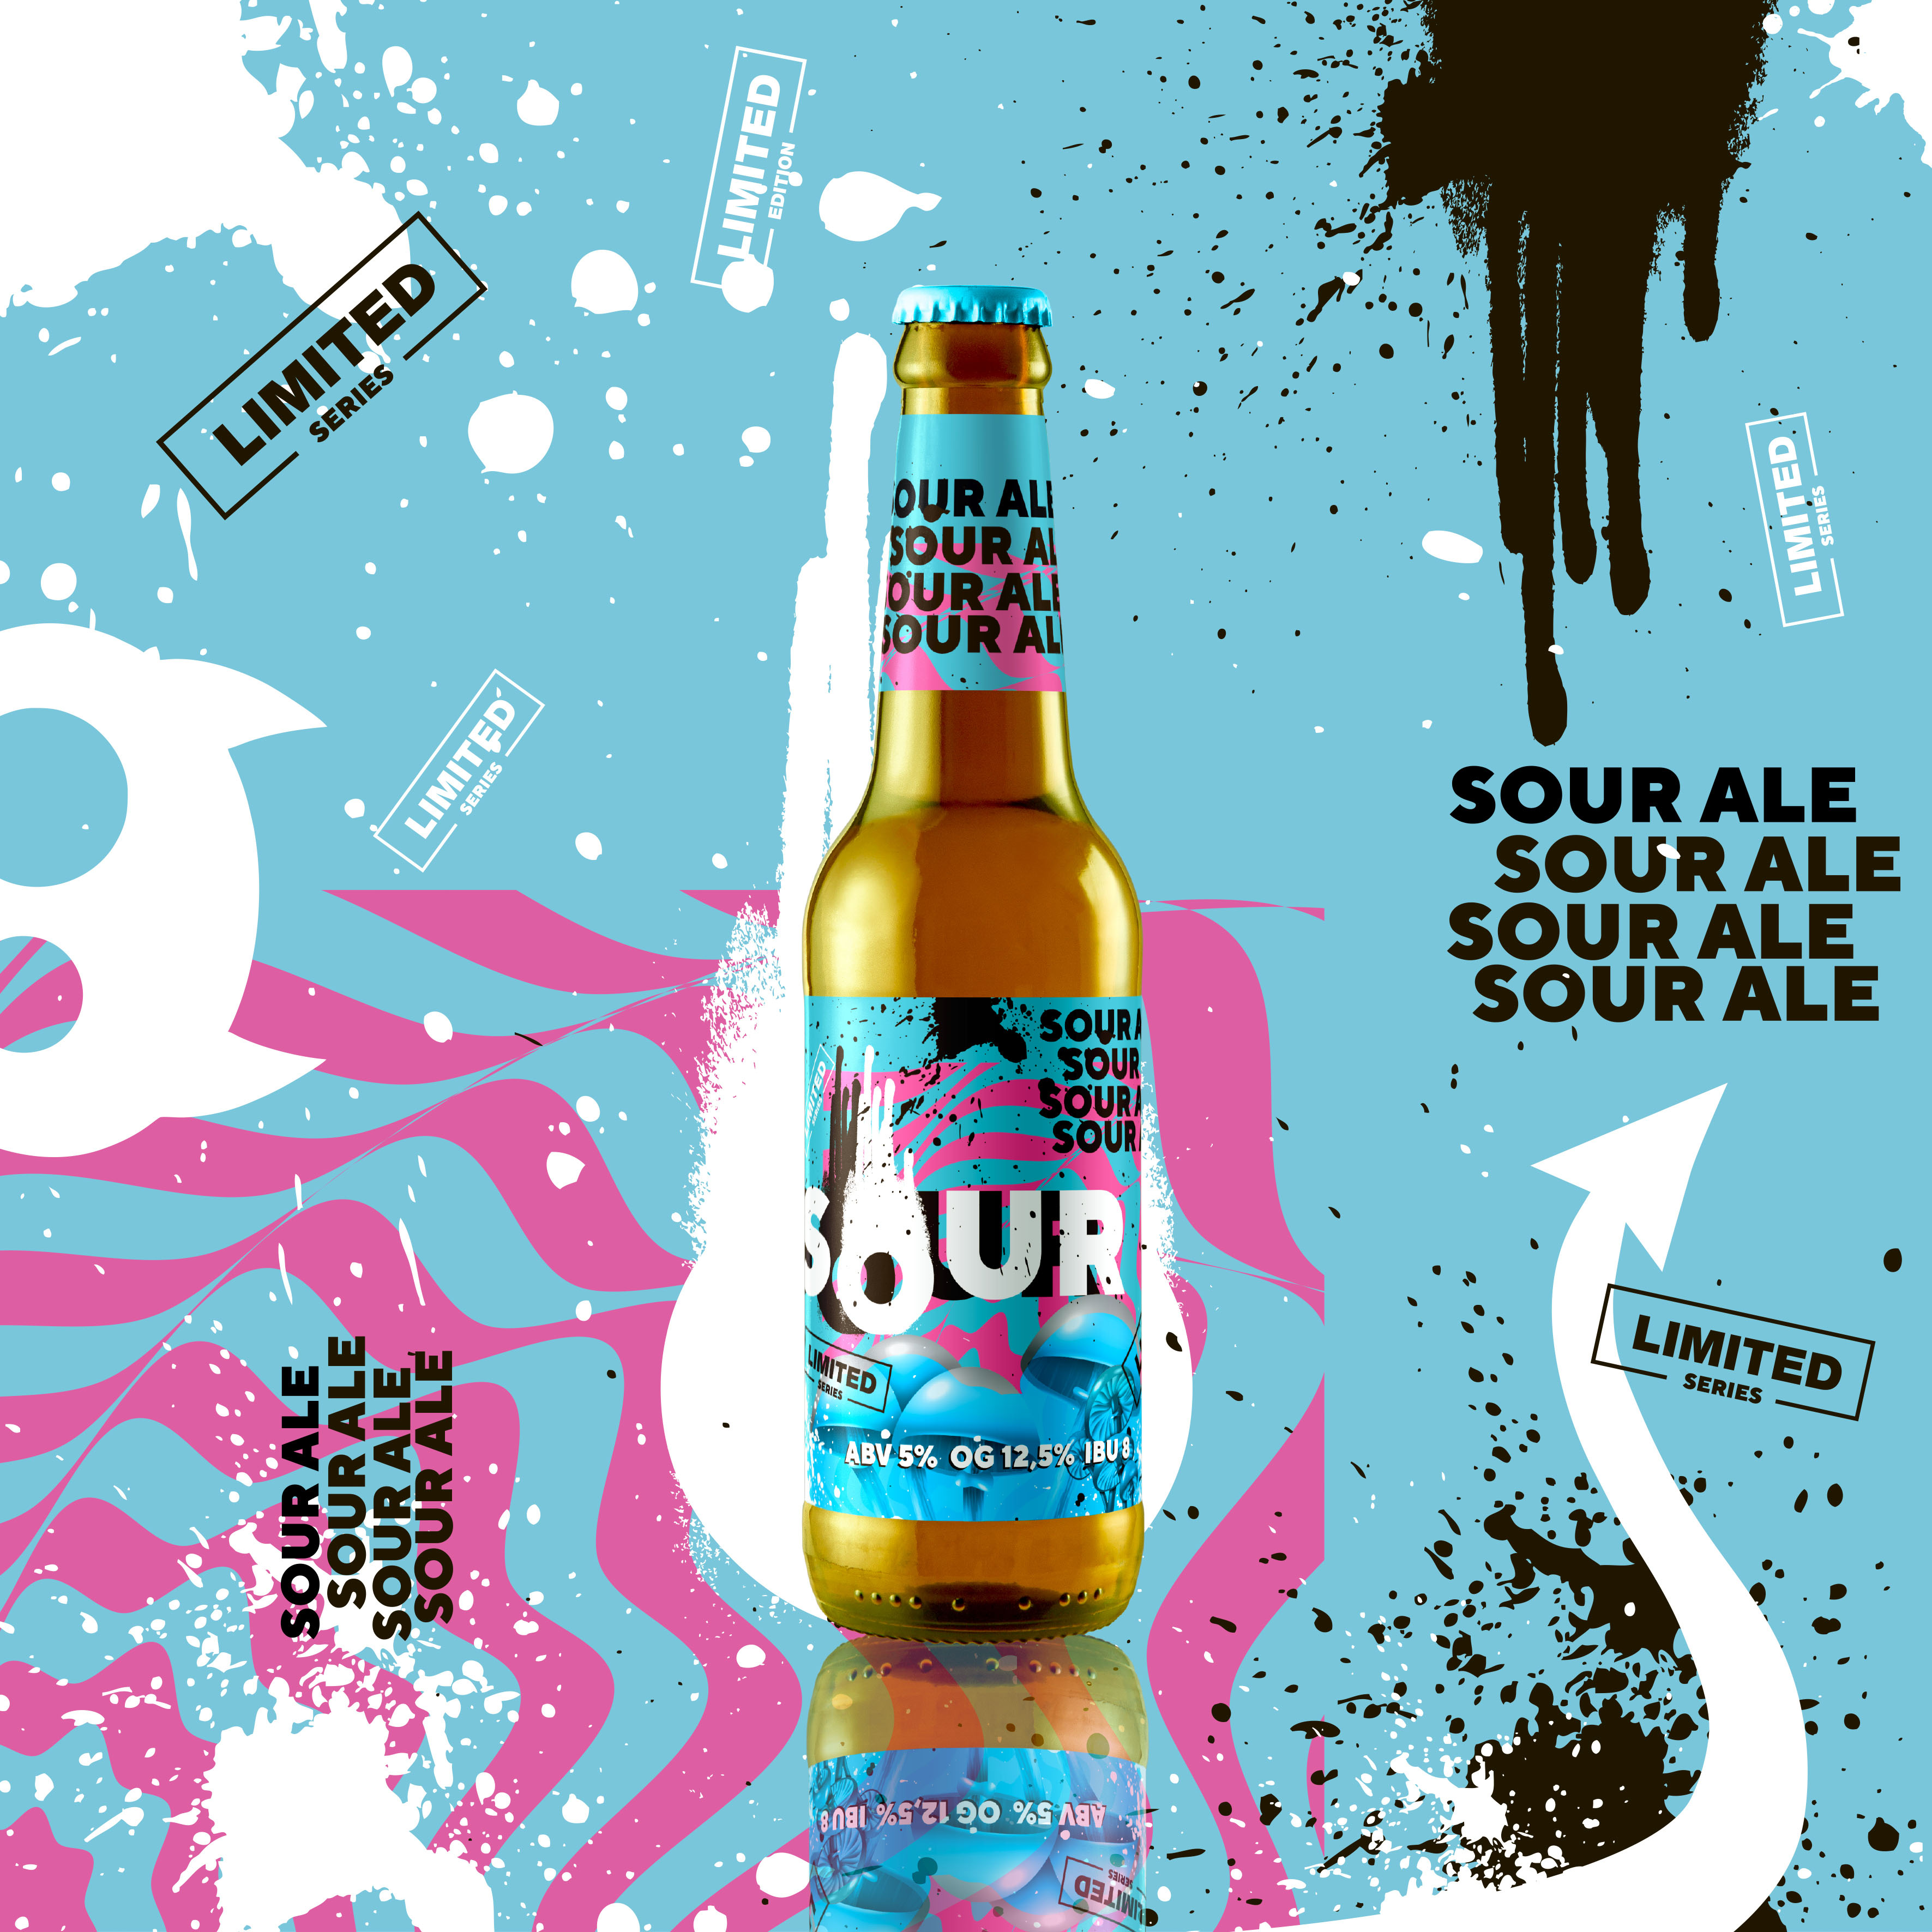 Pvel Reznik Creates New Beer Label Design for Red Cat Brewery Ukraine